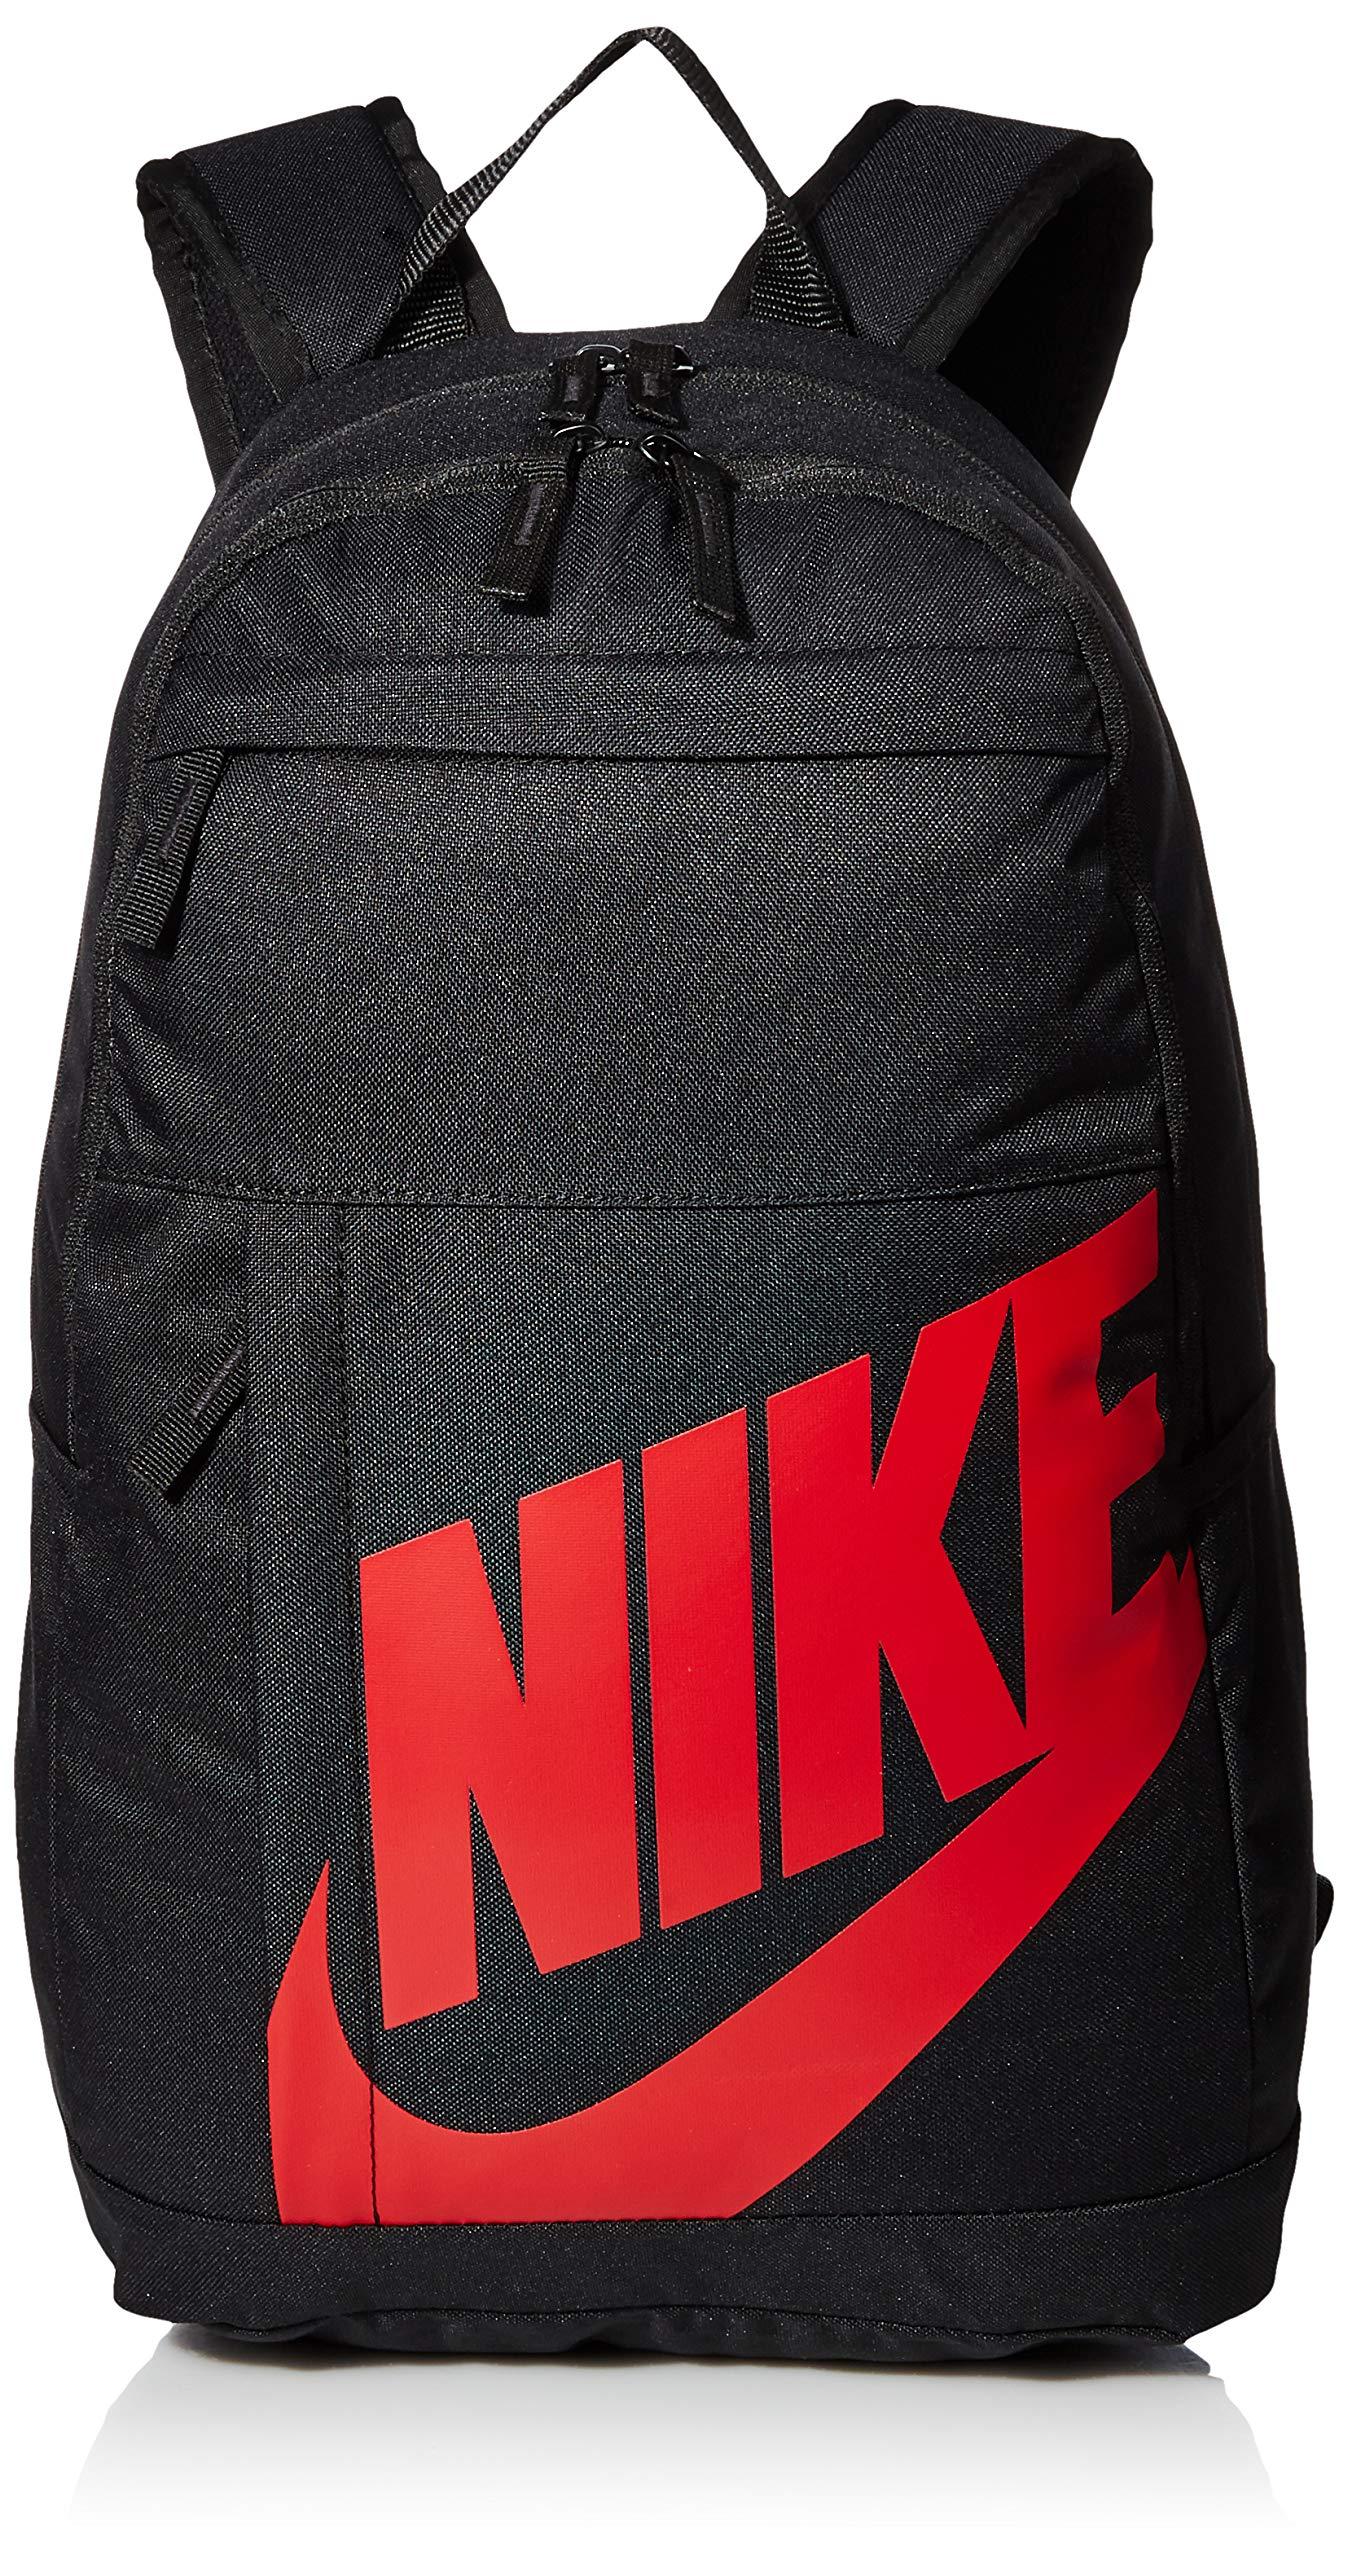 Nike Elemental-2.0, Black